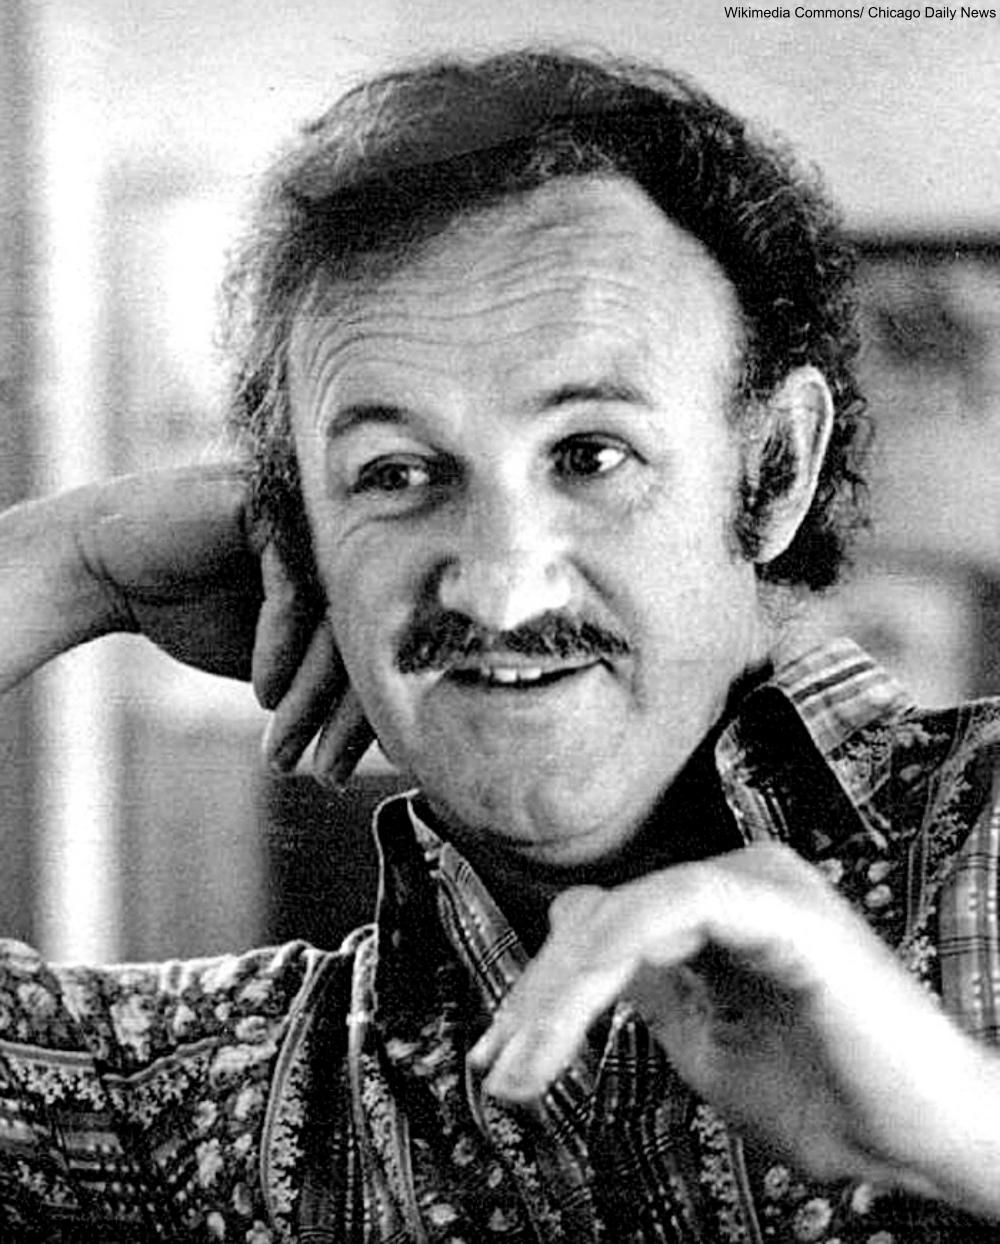 Gene Hackman in 1972